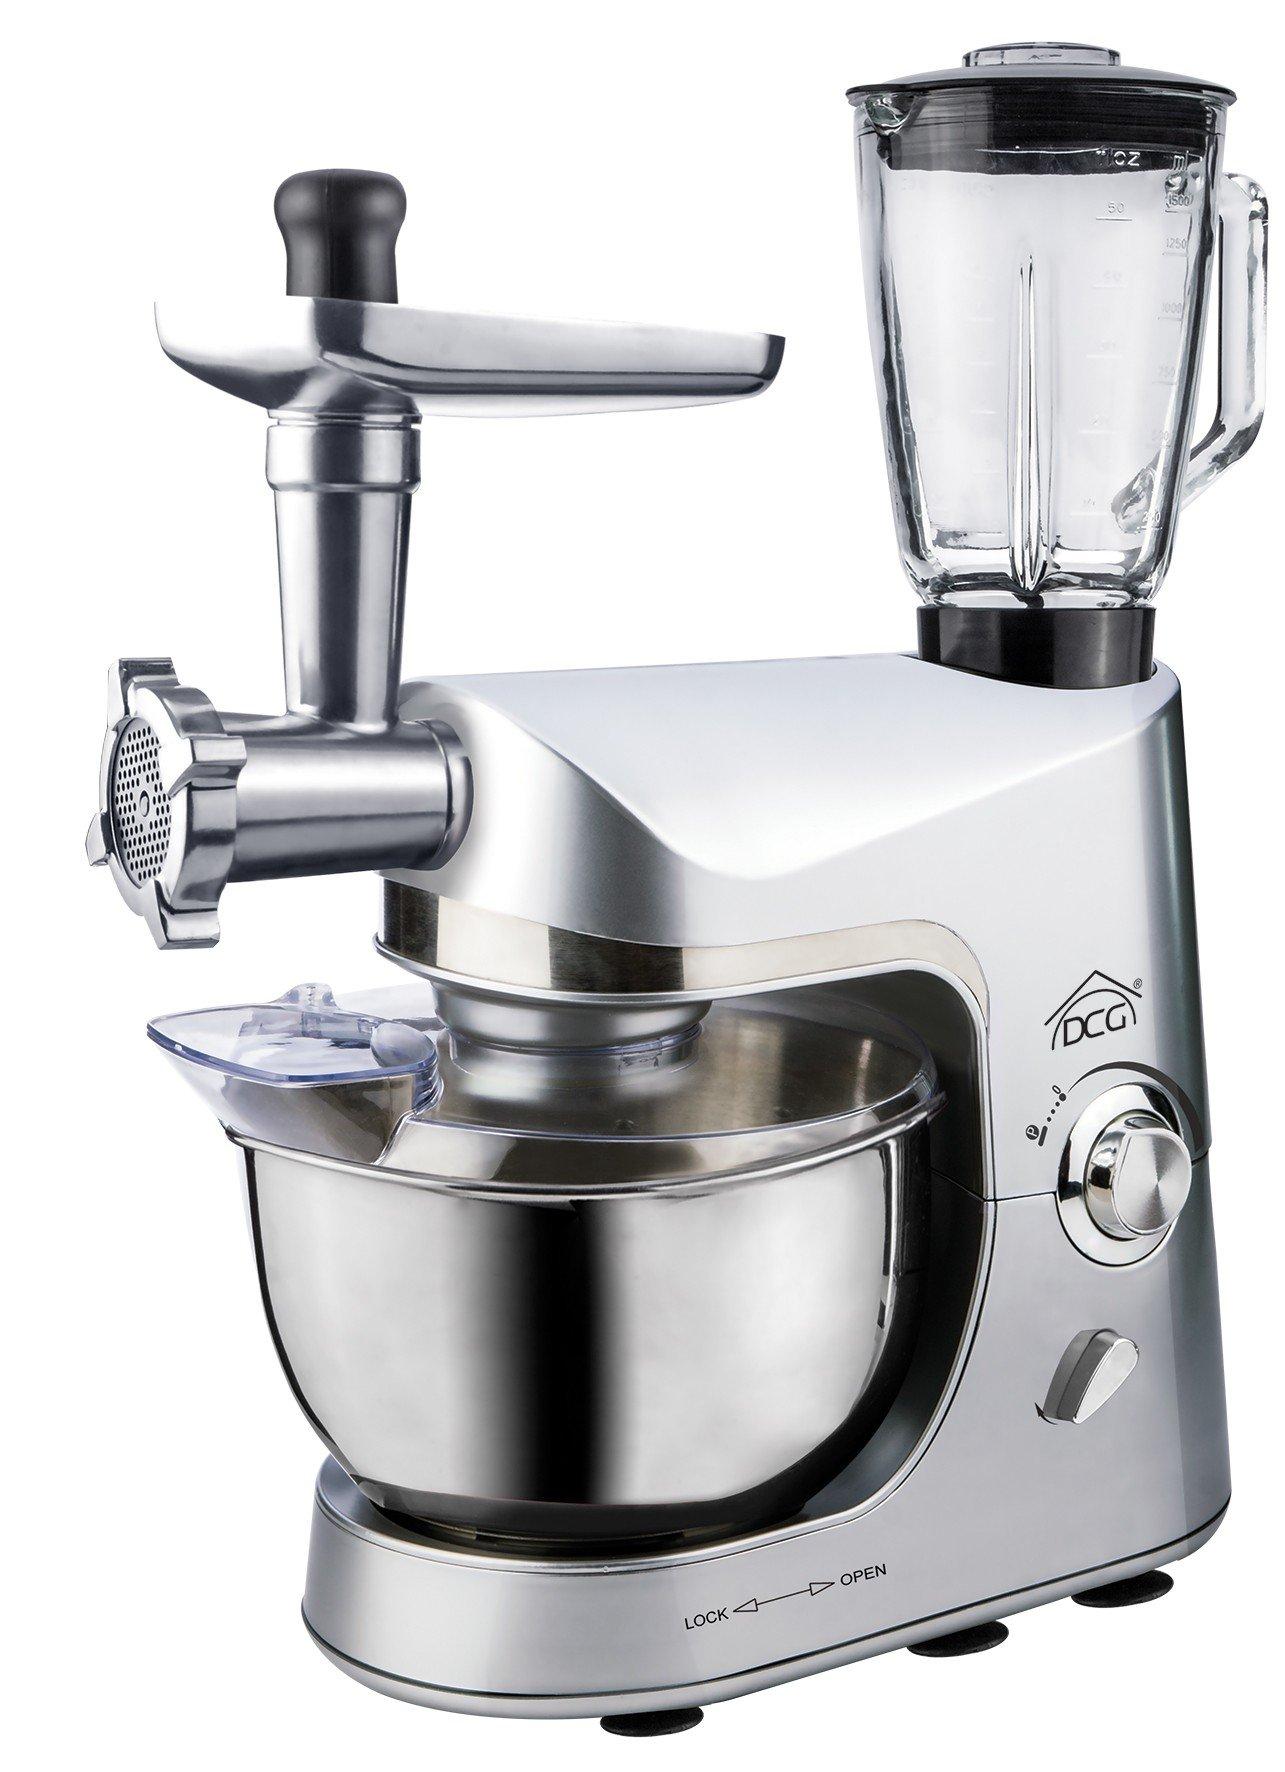 KM9085 Superchef DCG – Robot de cocina multifunción: Amazon.es: Hogar